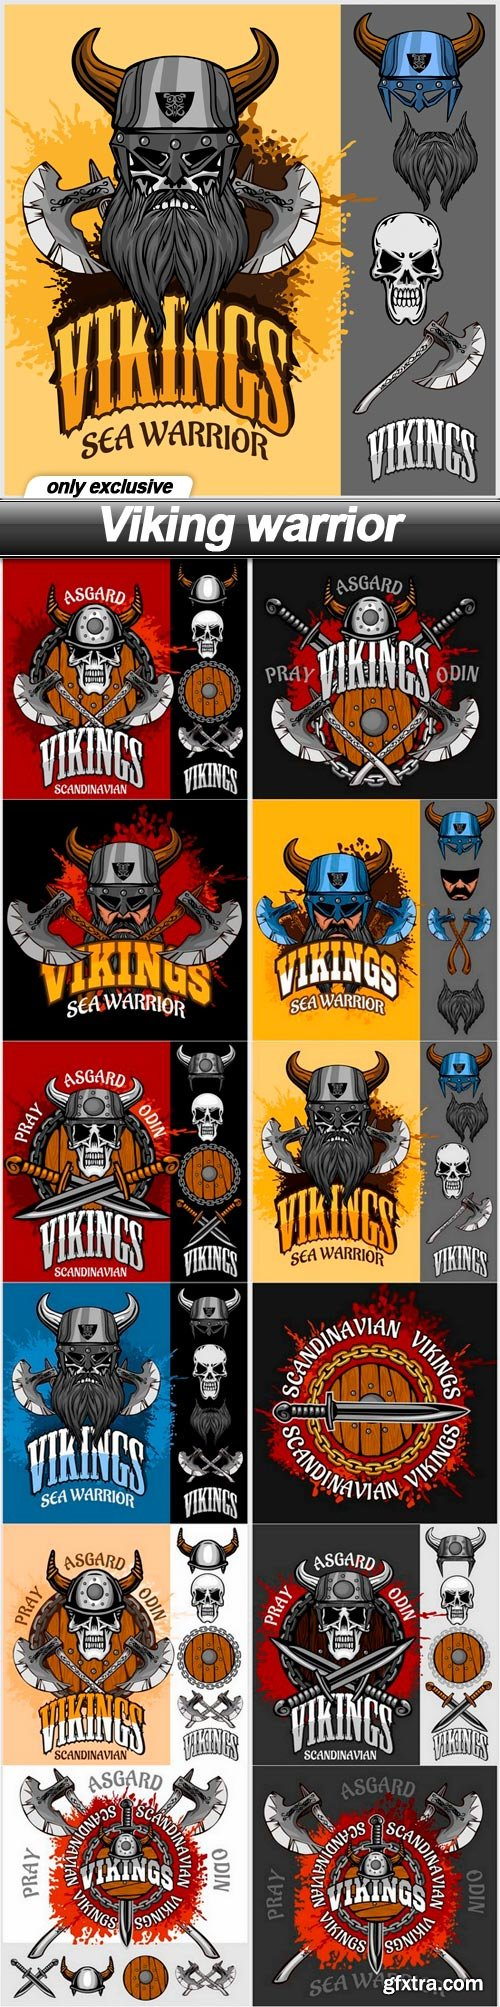 Viking warrior - 12 EPS